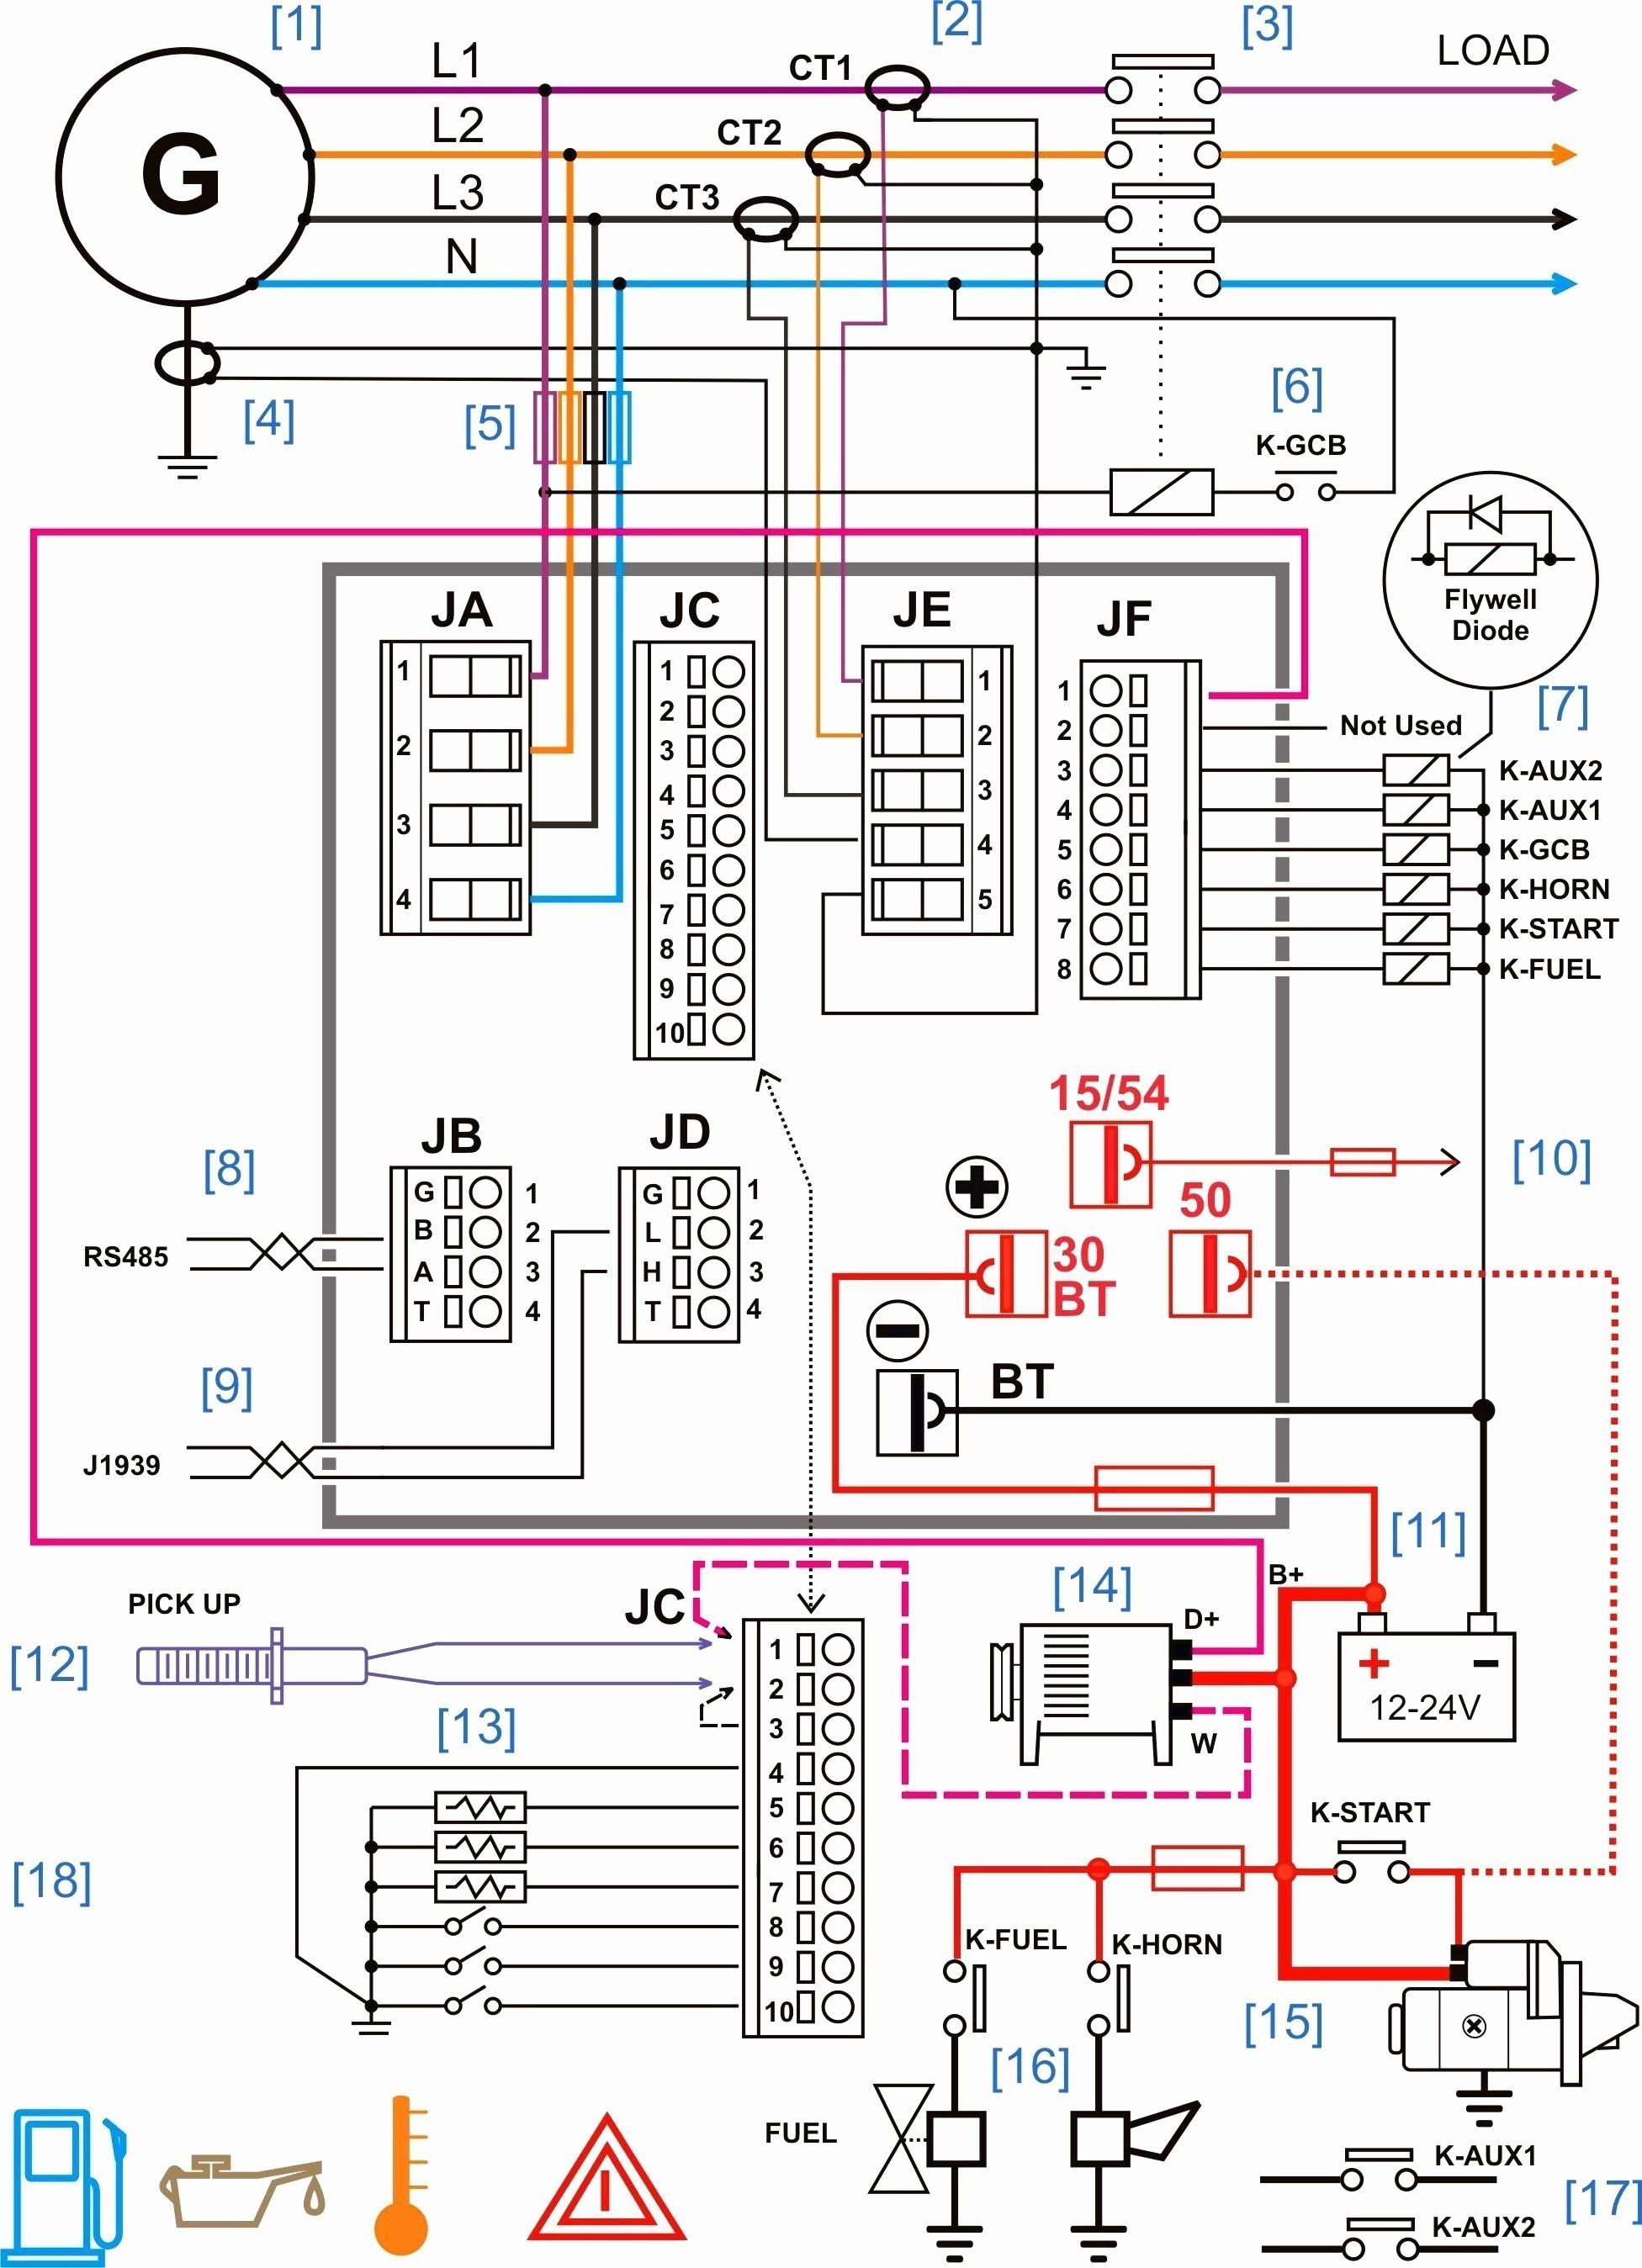 Simple Car Diagram Save Audi A4 Cd Player Wiring Diagram Of Simple Car Diagram